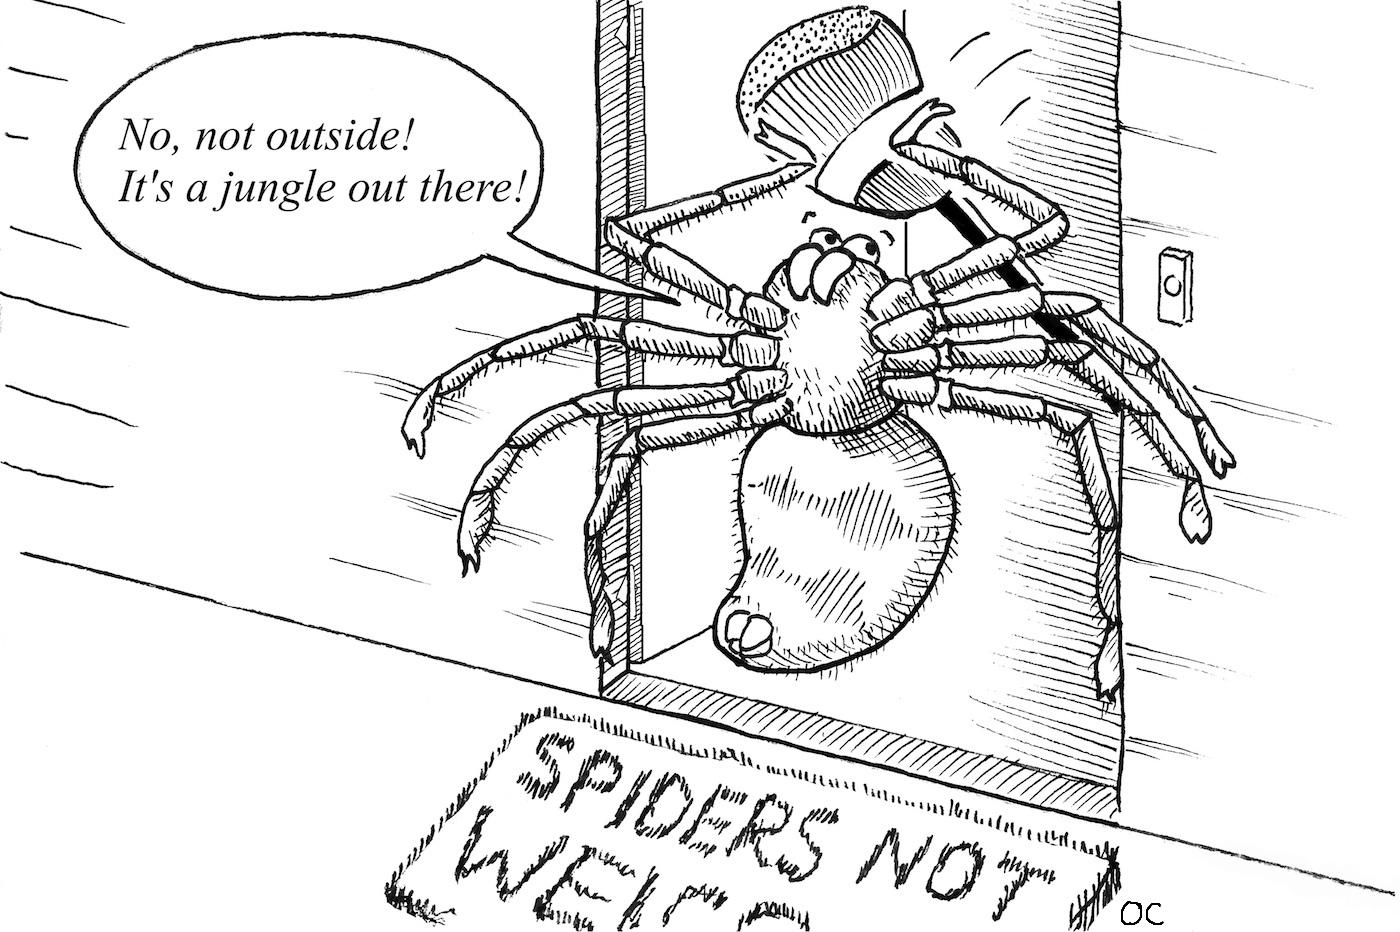 Drawn spider not From a spider Owen a